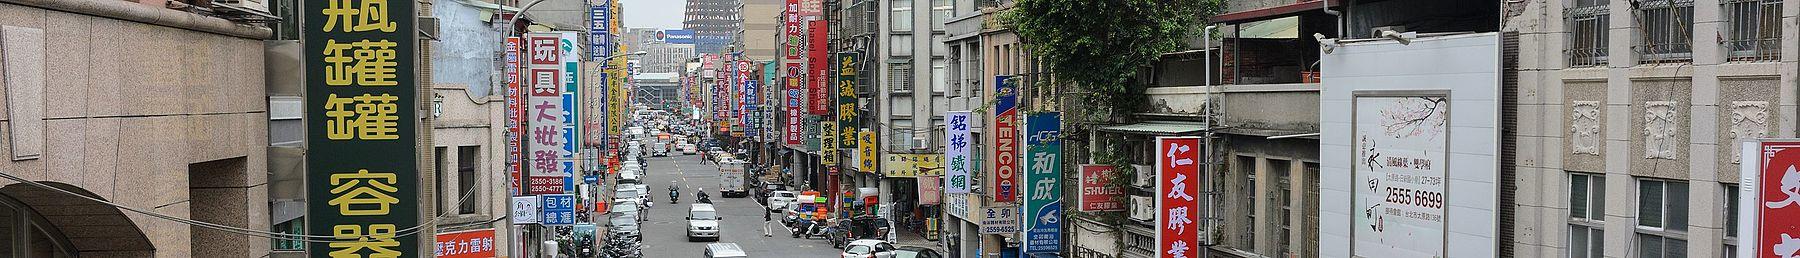 Taipei - Old Taipei banner.jpg